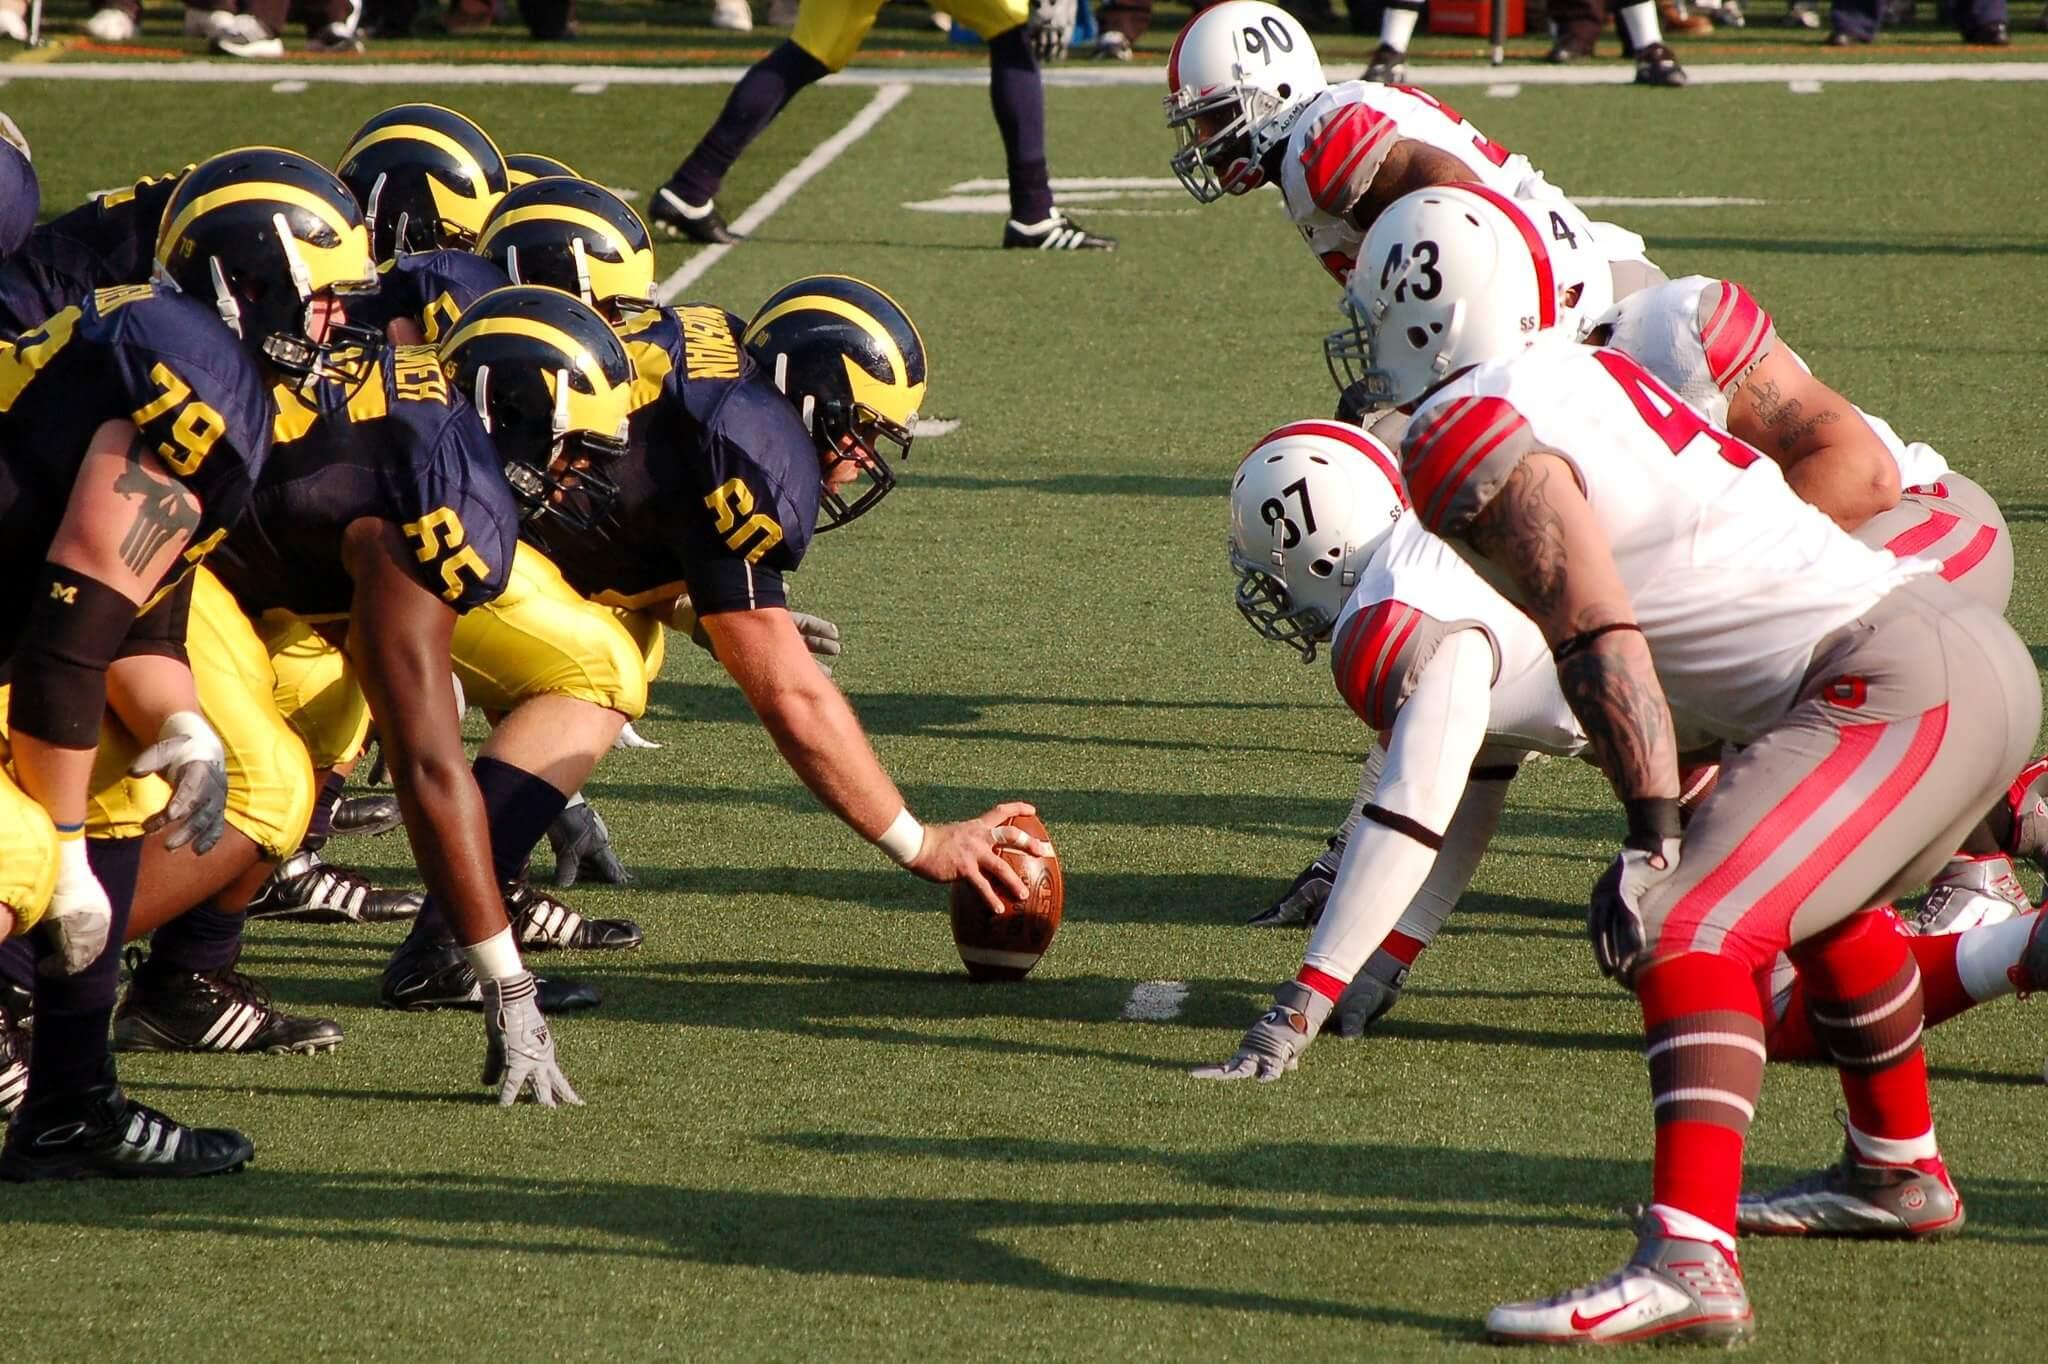 Michigan vs Ohio State The Game football